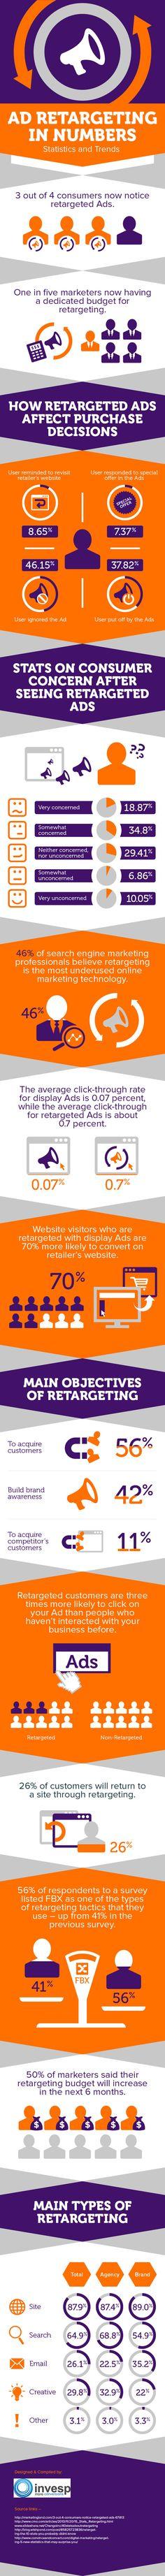 Ad retargeting in numbers: statistics & trends [infographic] #remarketing #infographics #modernistablog